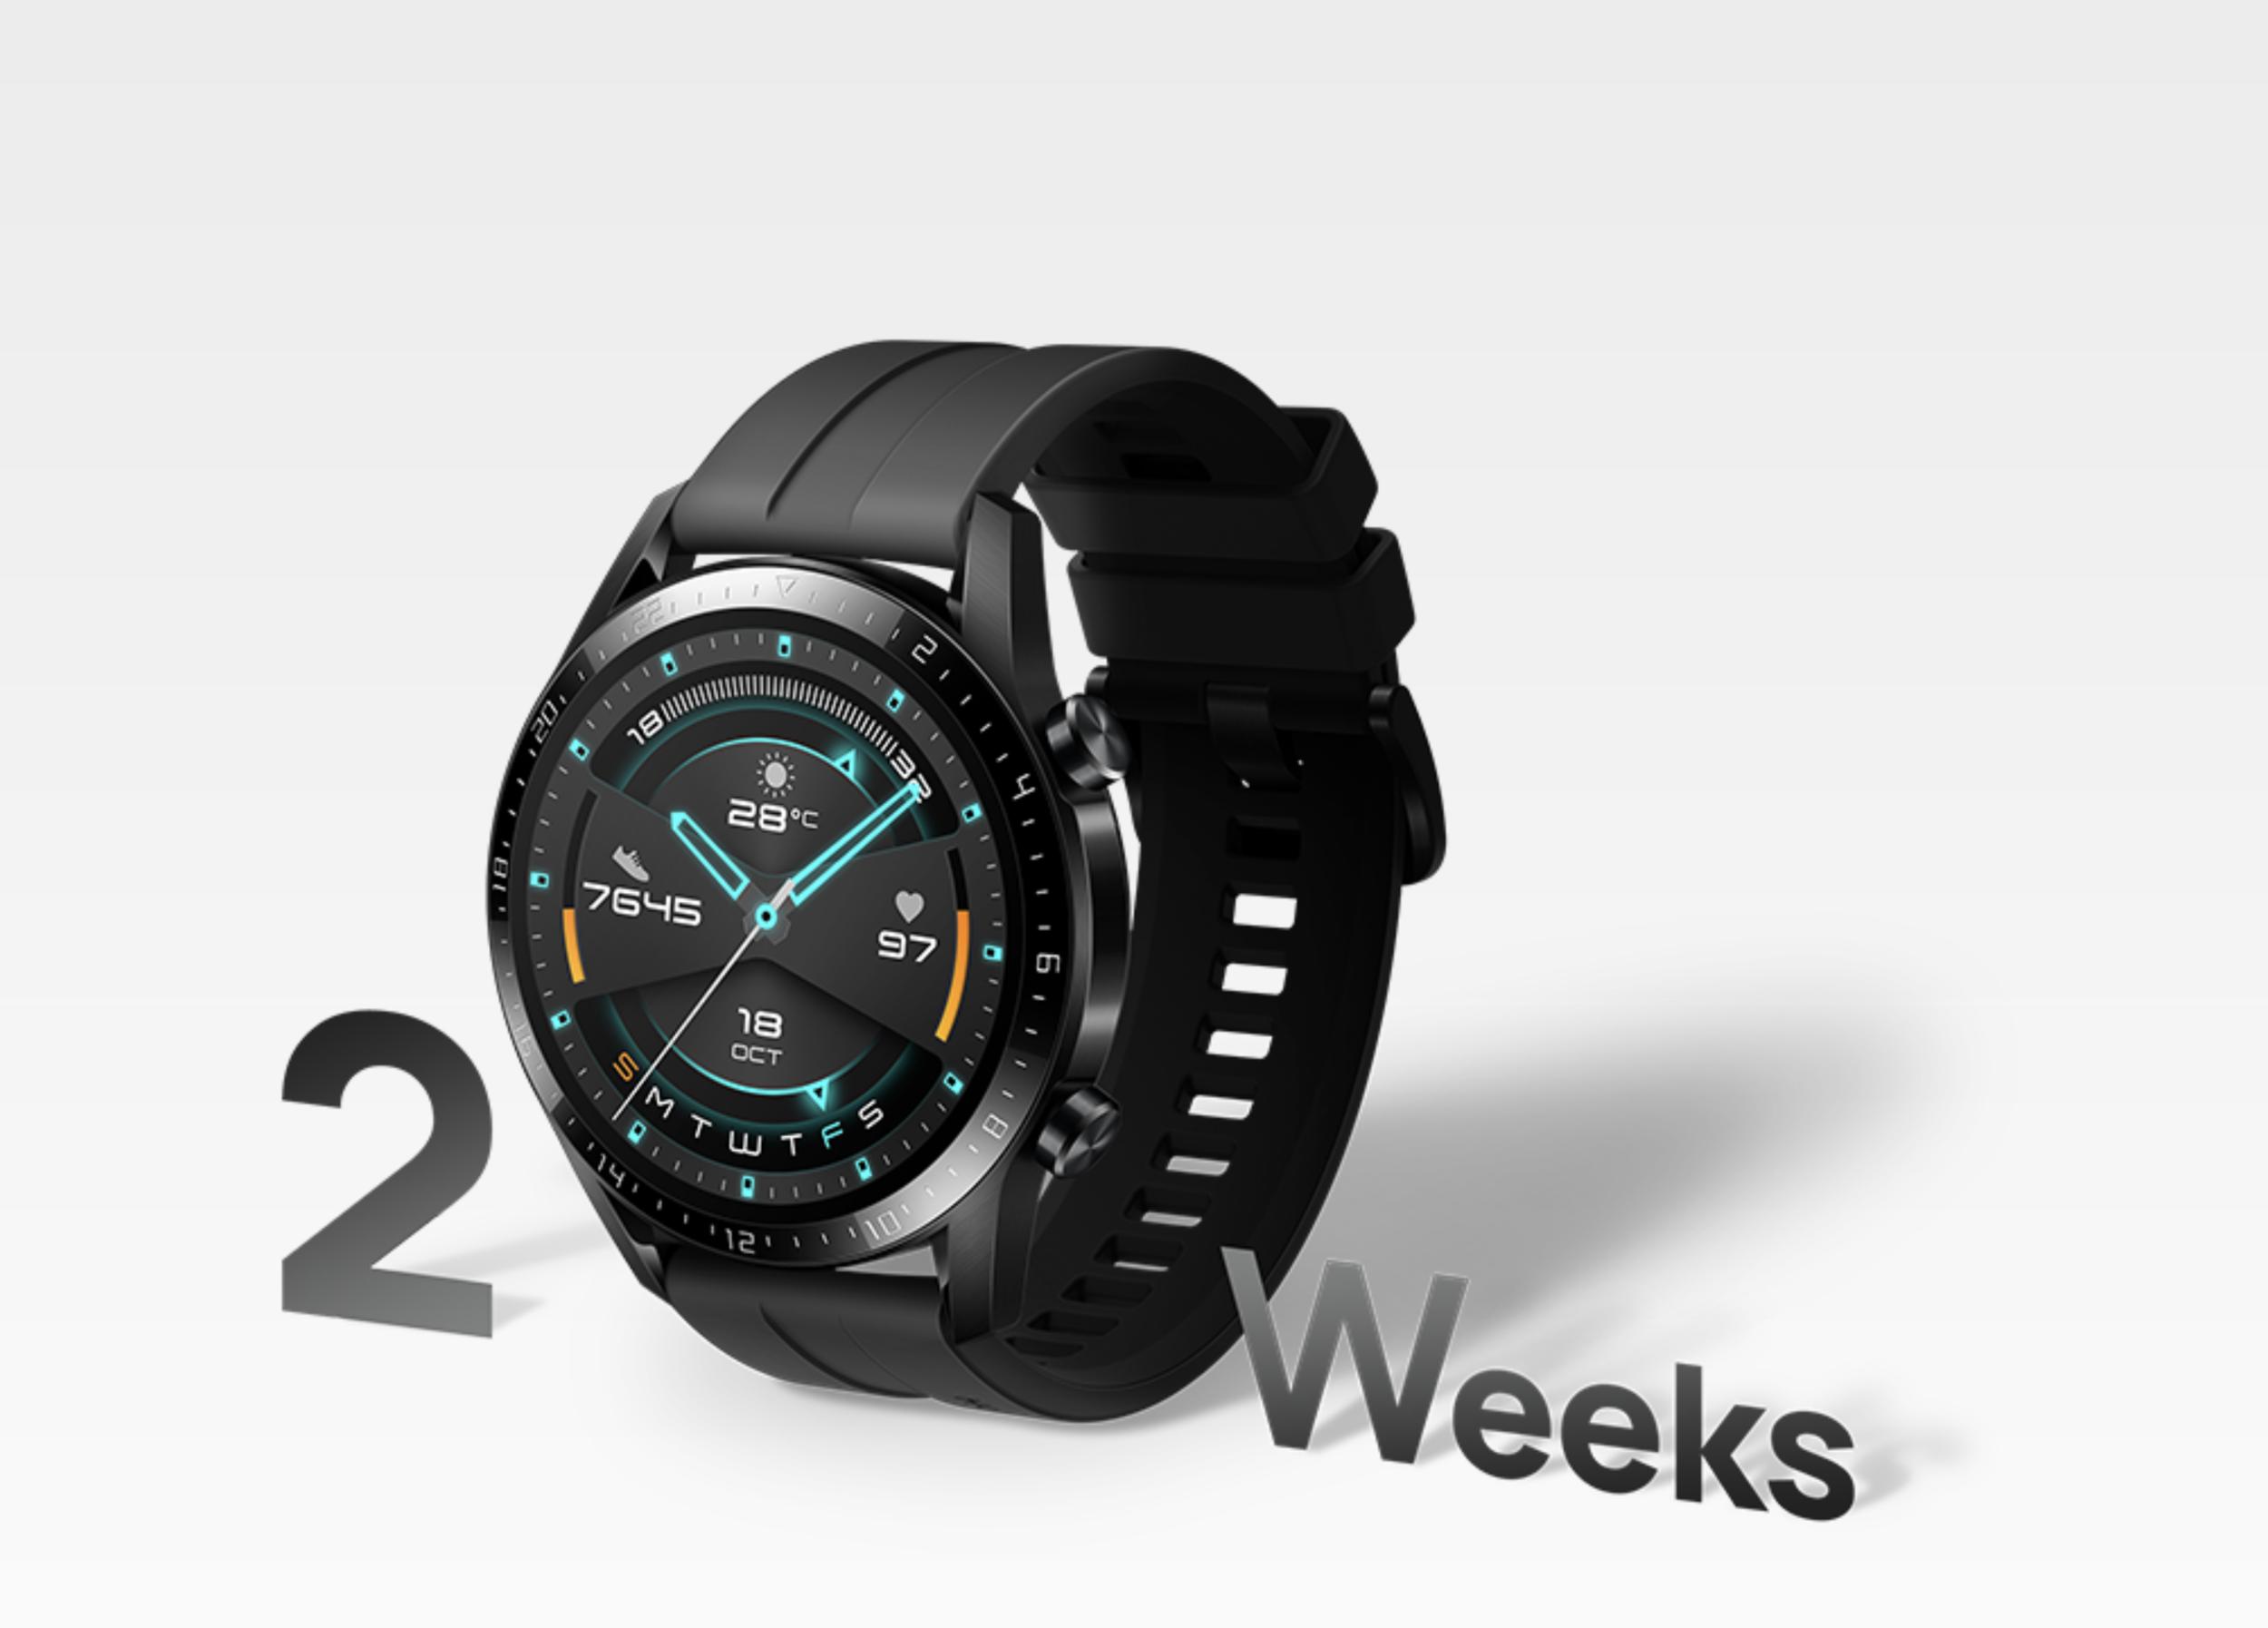 Huawei Gt2 Watch Review Apple watch, Smart watch, Watches